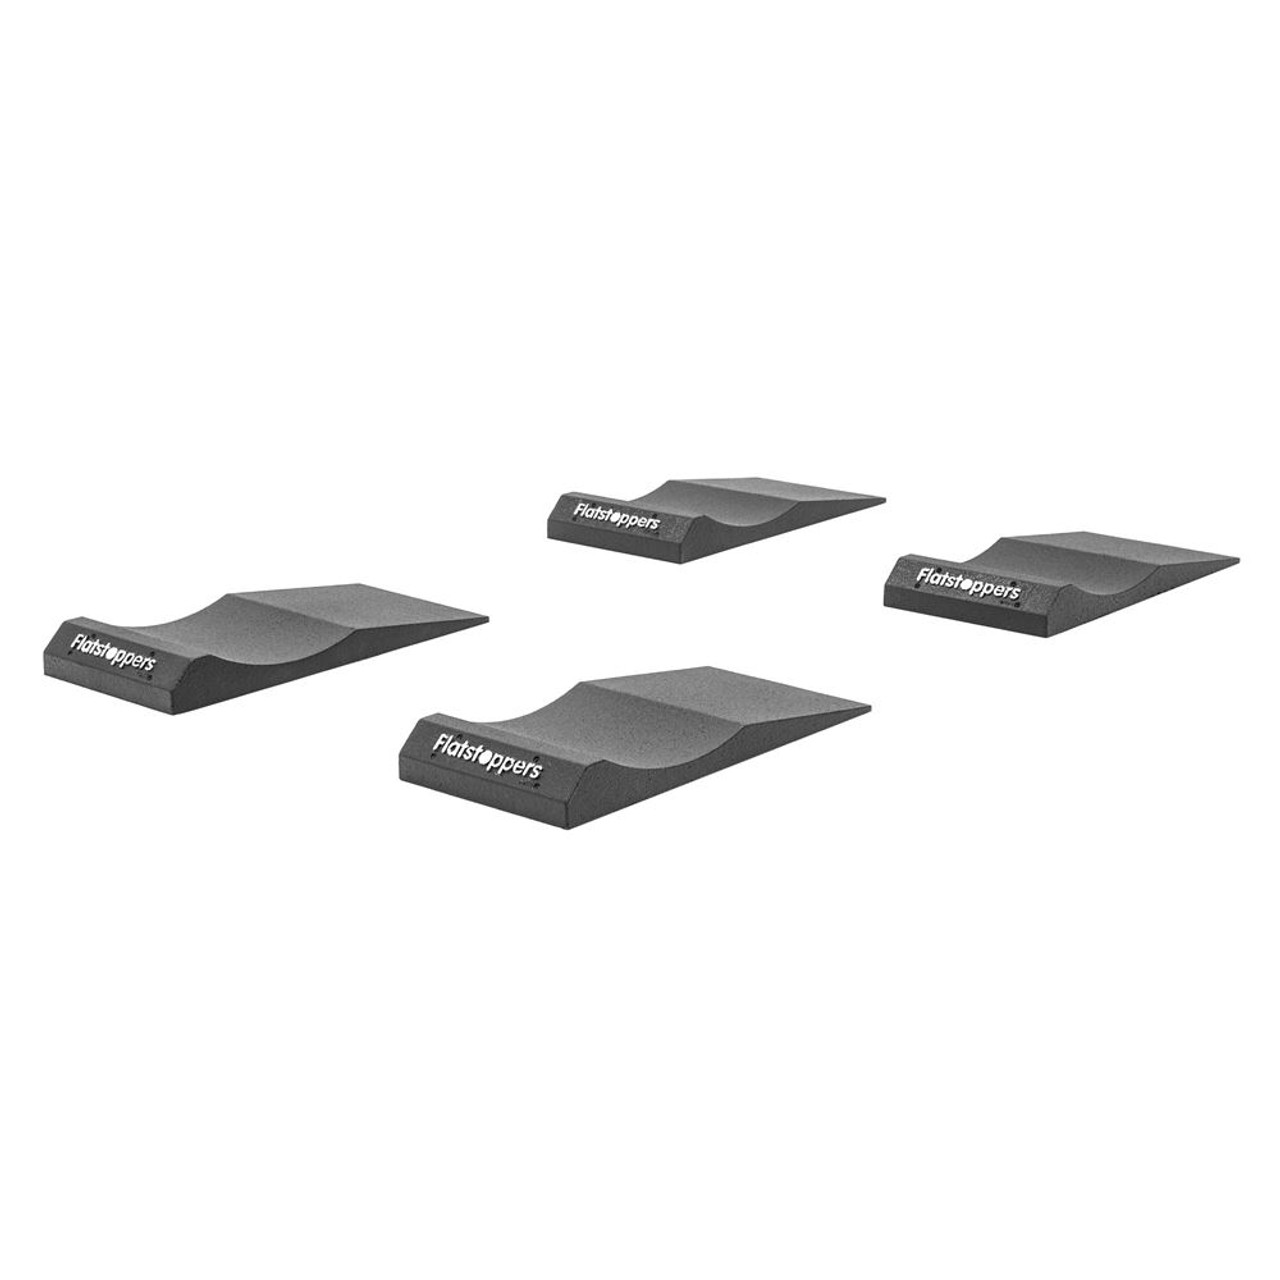 "Race Ramps 14"" W FlatStoppers Car Storage Ramps - 4 Pack (RR-FS)"